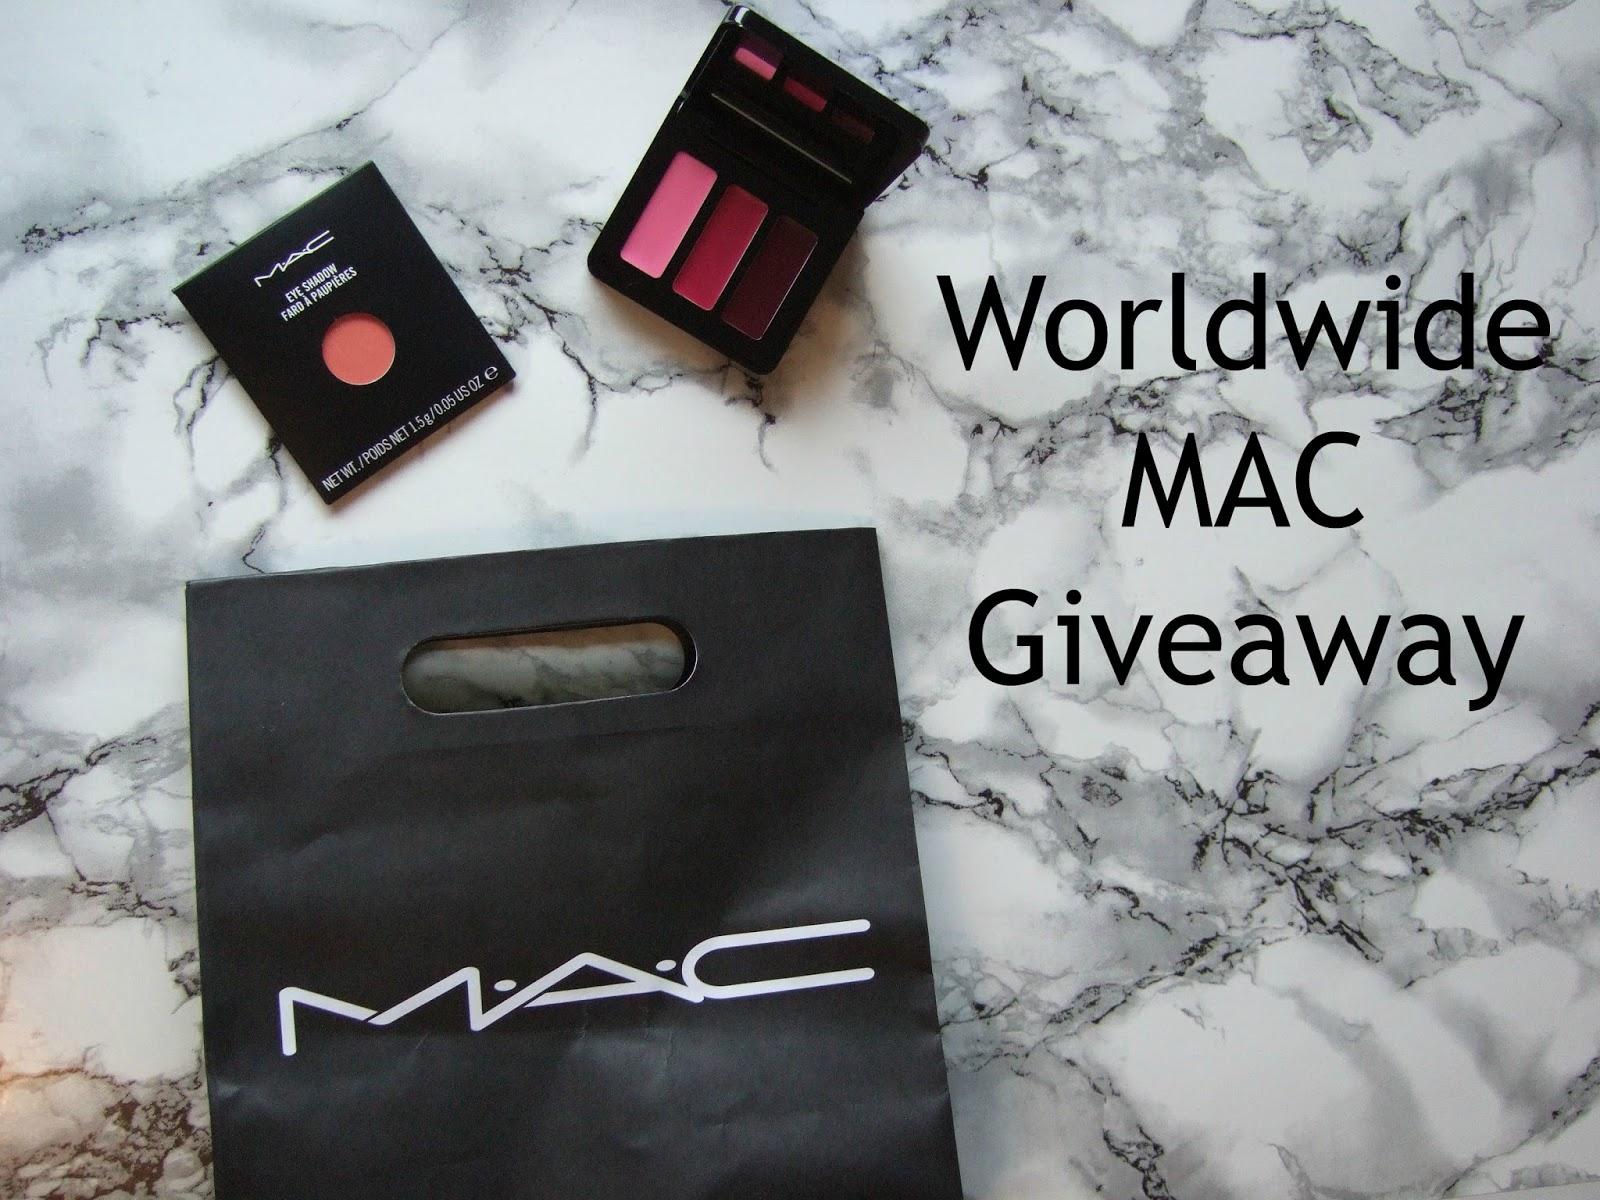 March MAC-ness: Worldwide MAC Giveaway #3